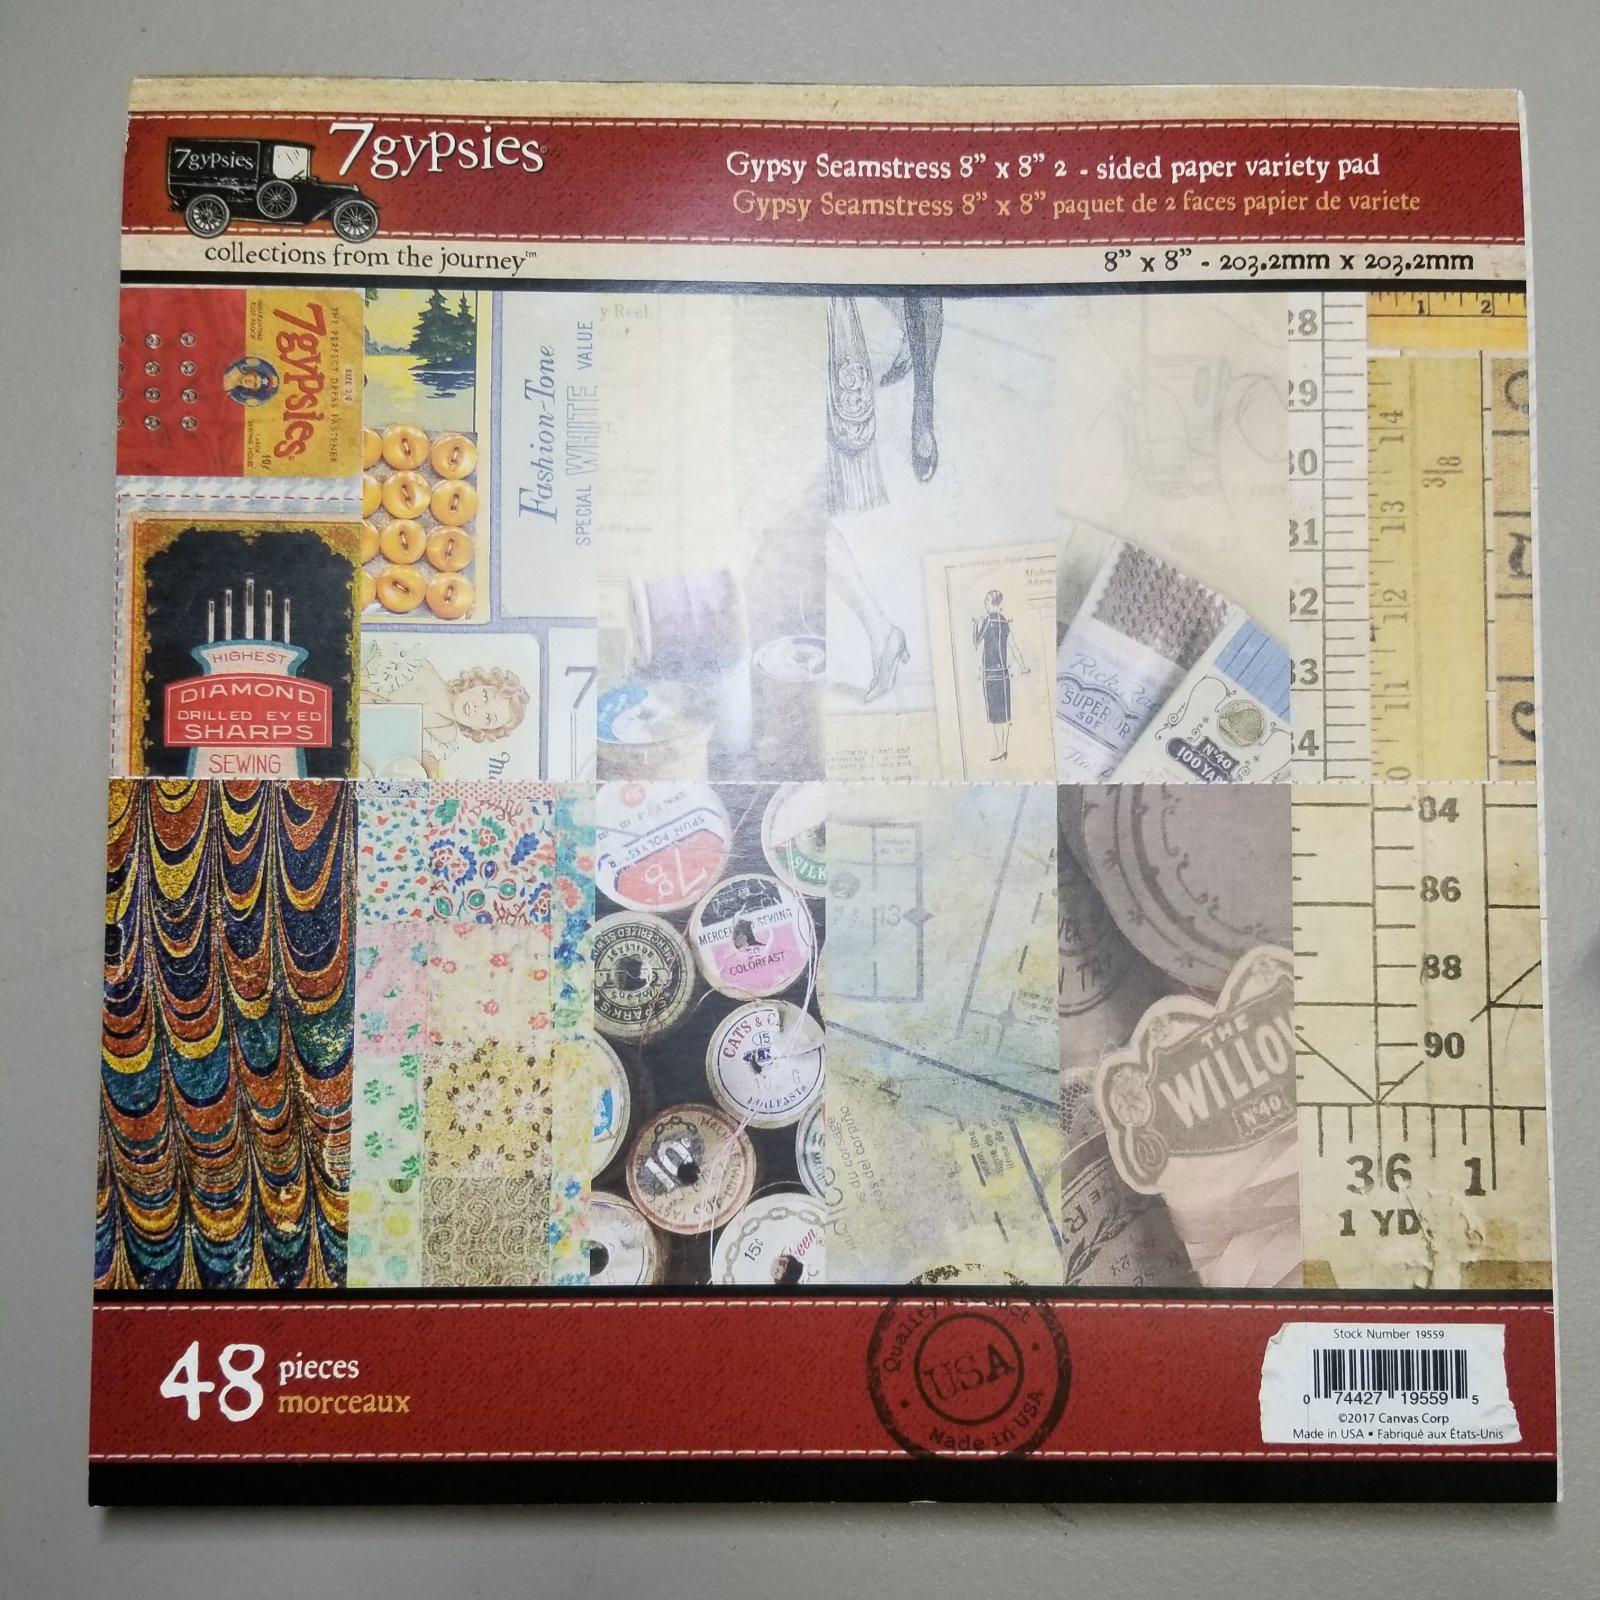 7gypsies Gypsy Seamstress 8 x8 2-sided paper variety pad